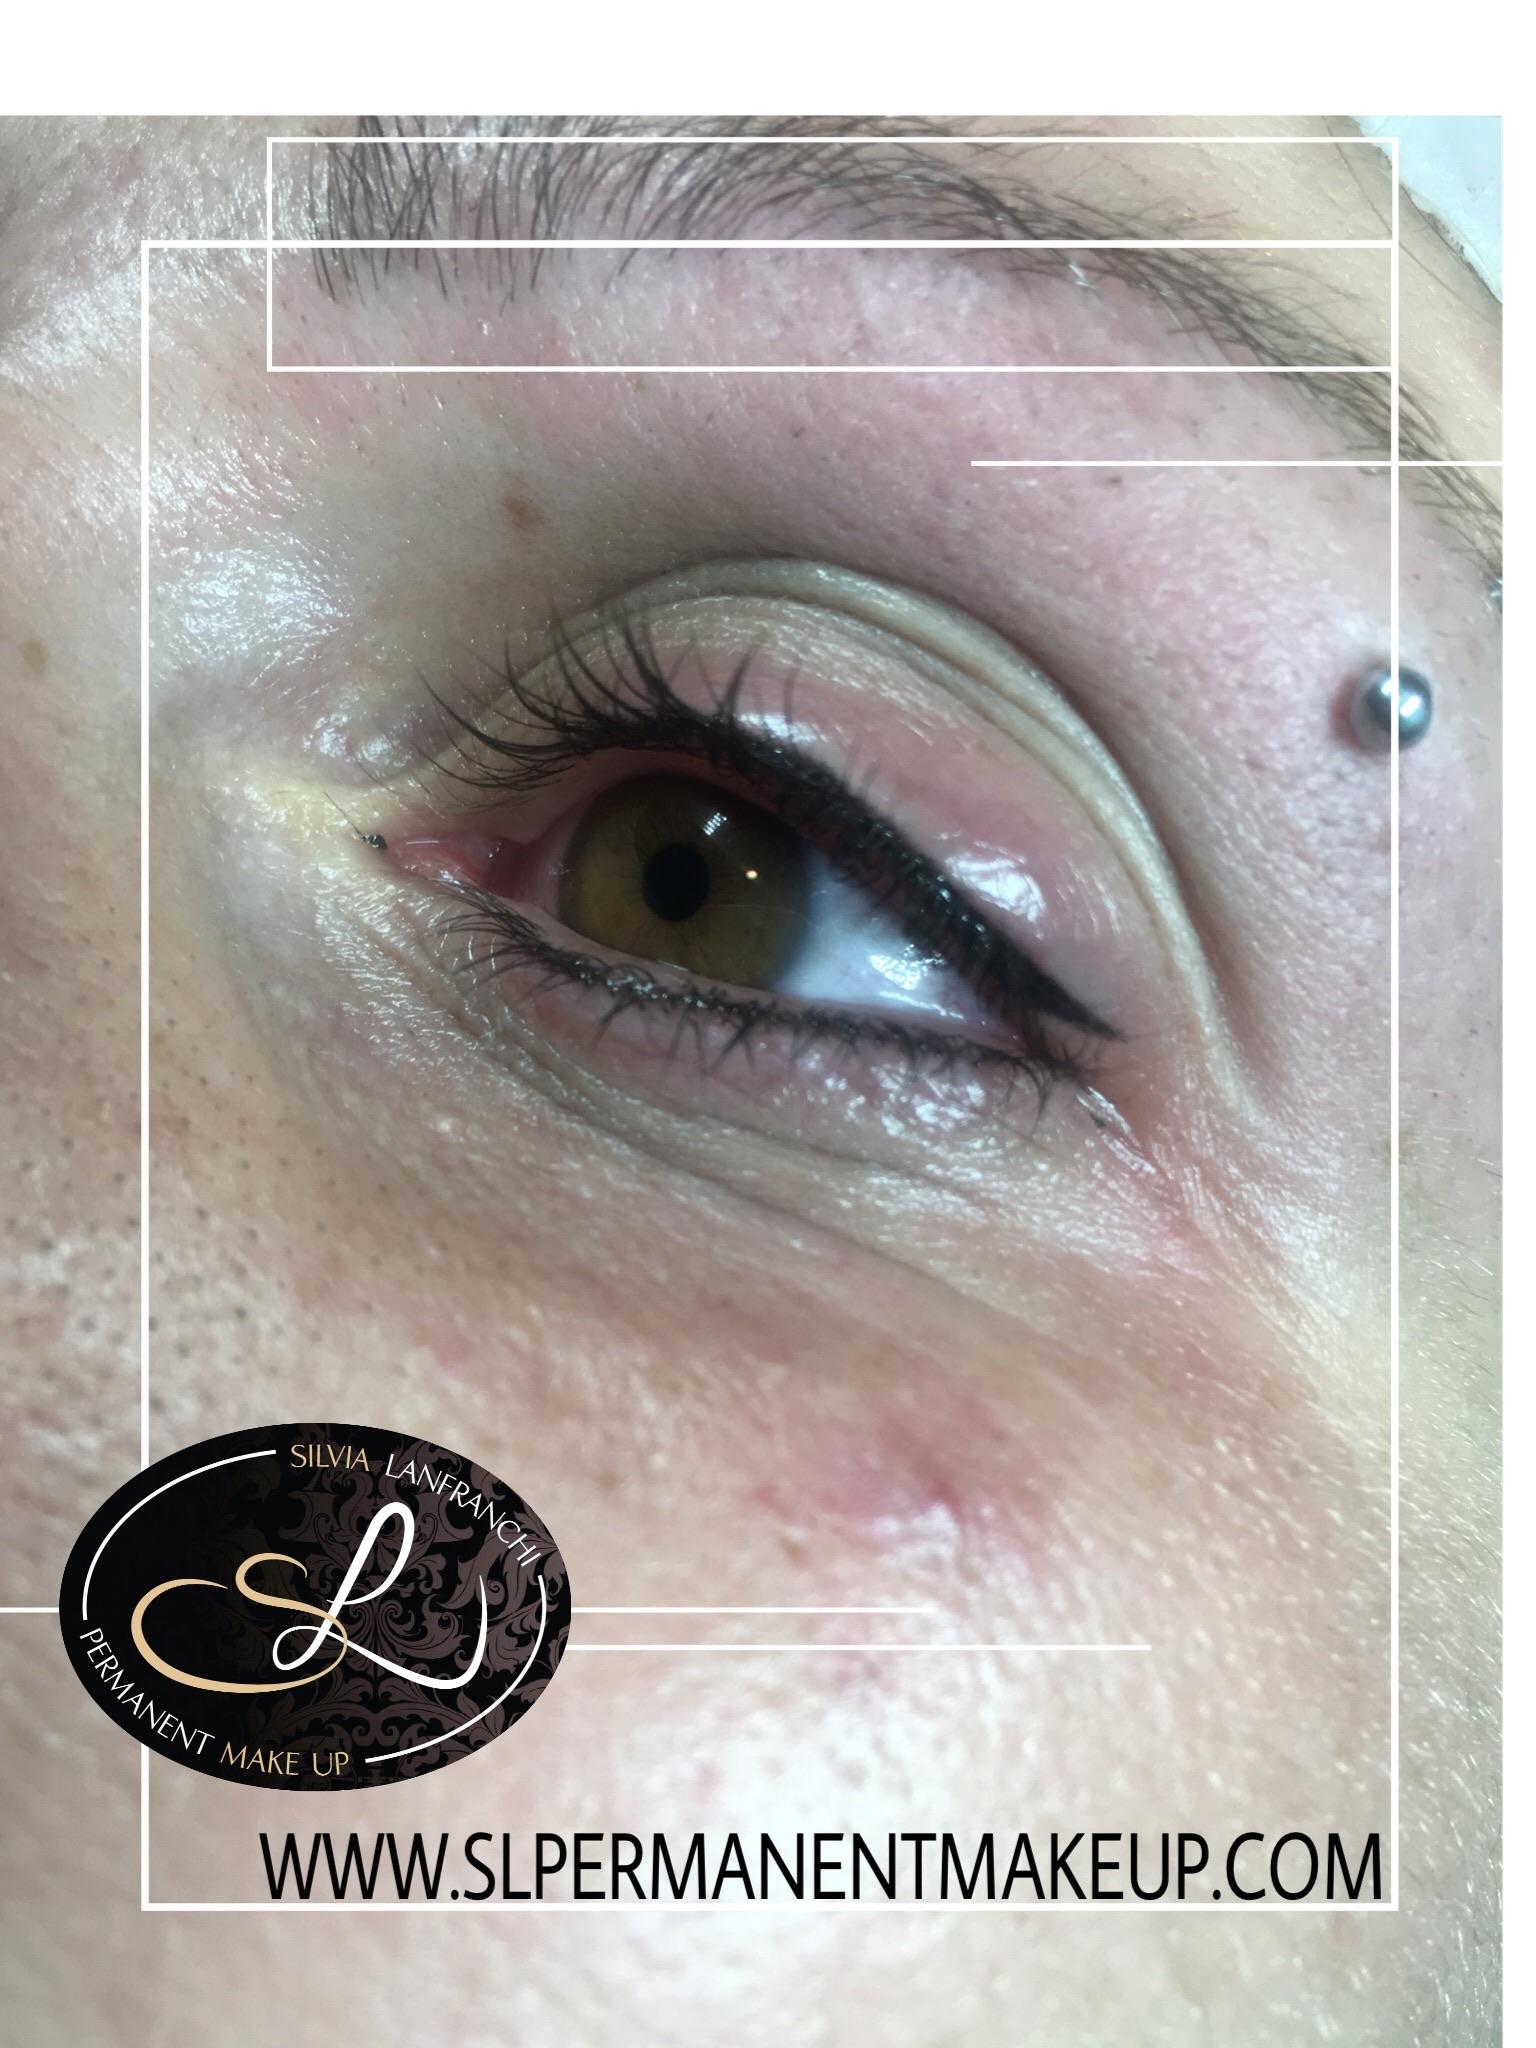 SL Permanent Make Up